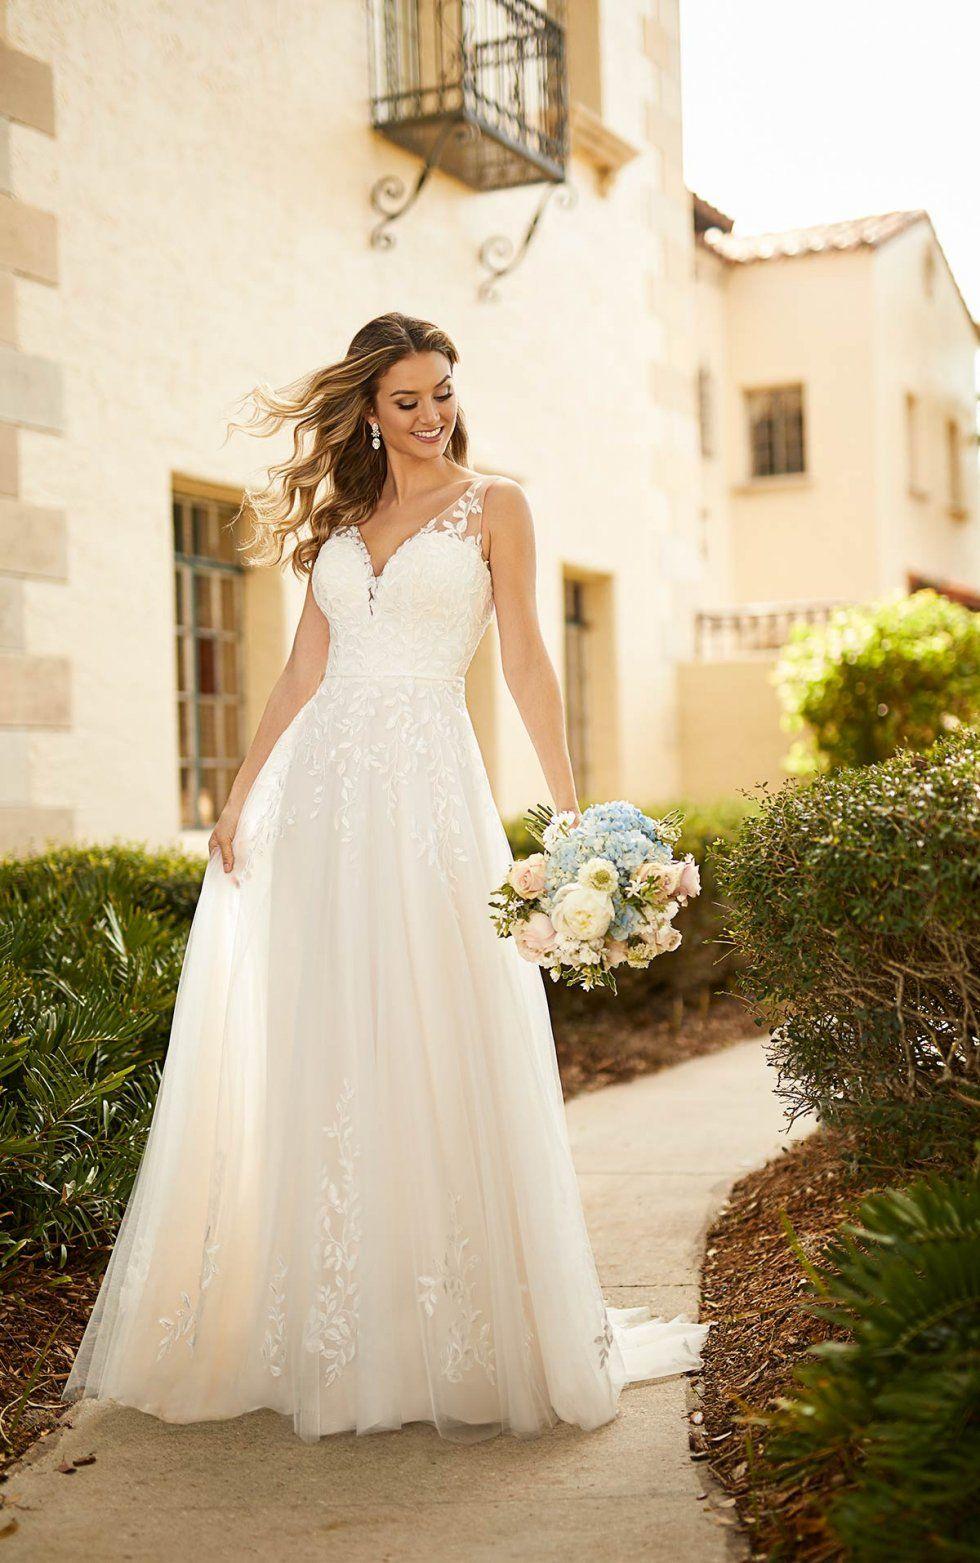 Illusion Strap Wedding Dress   Stella york bridal, York wedding ...